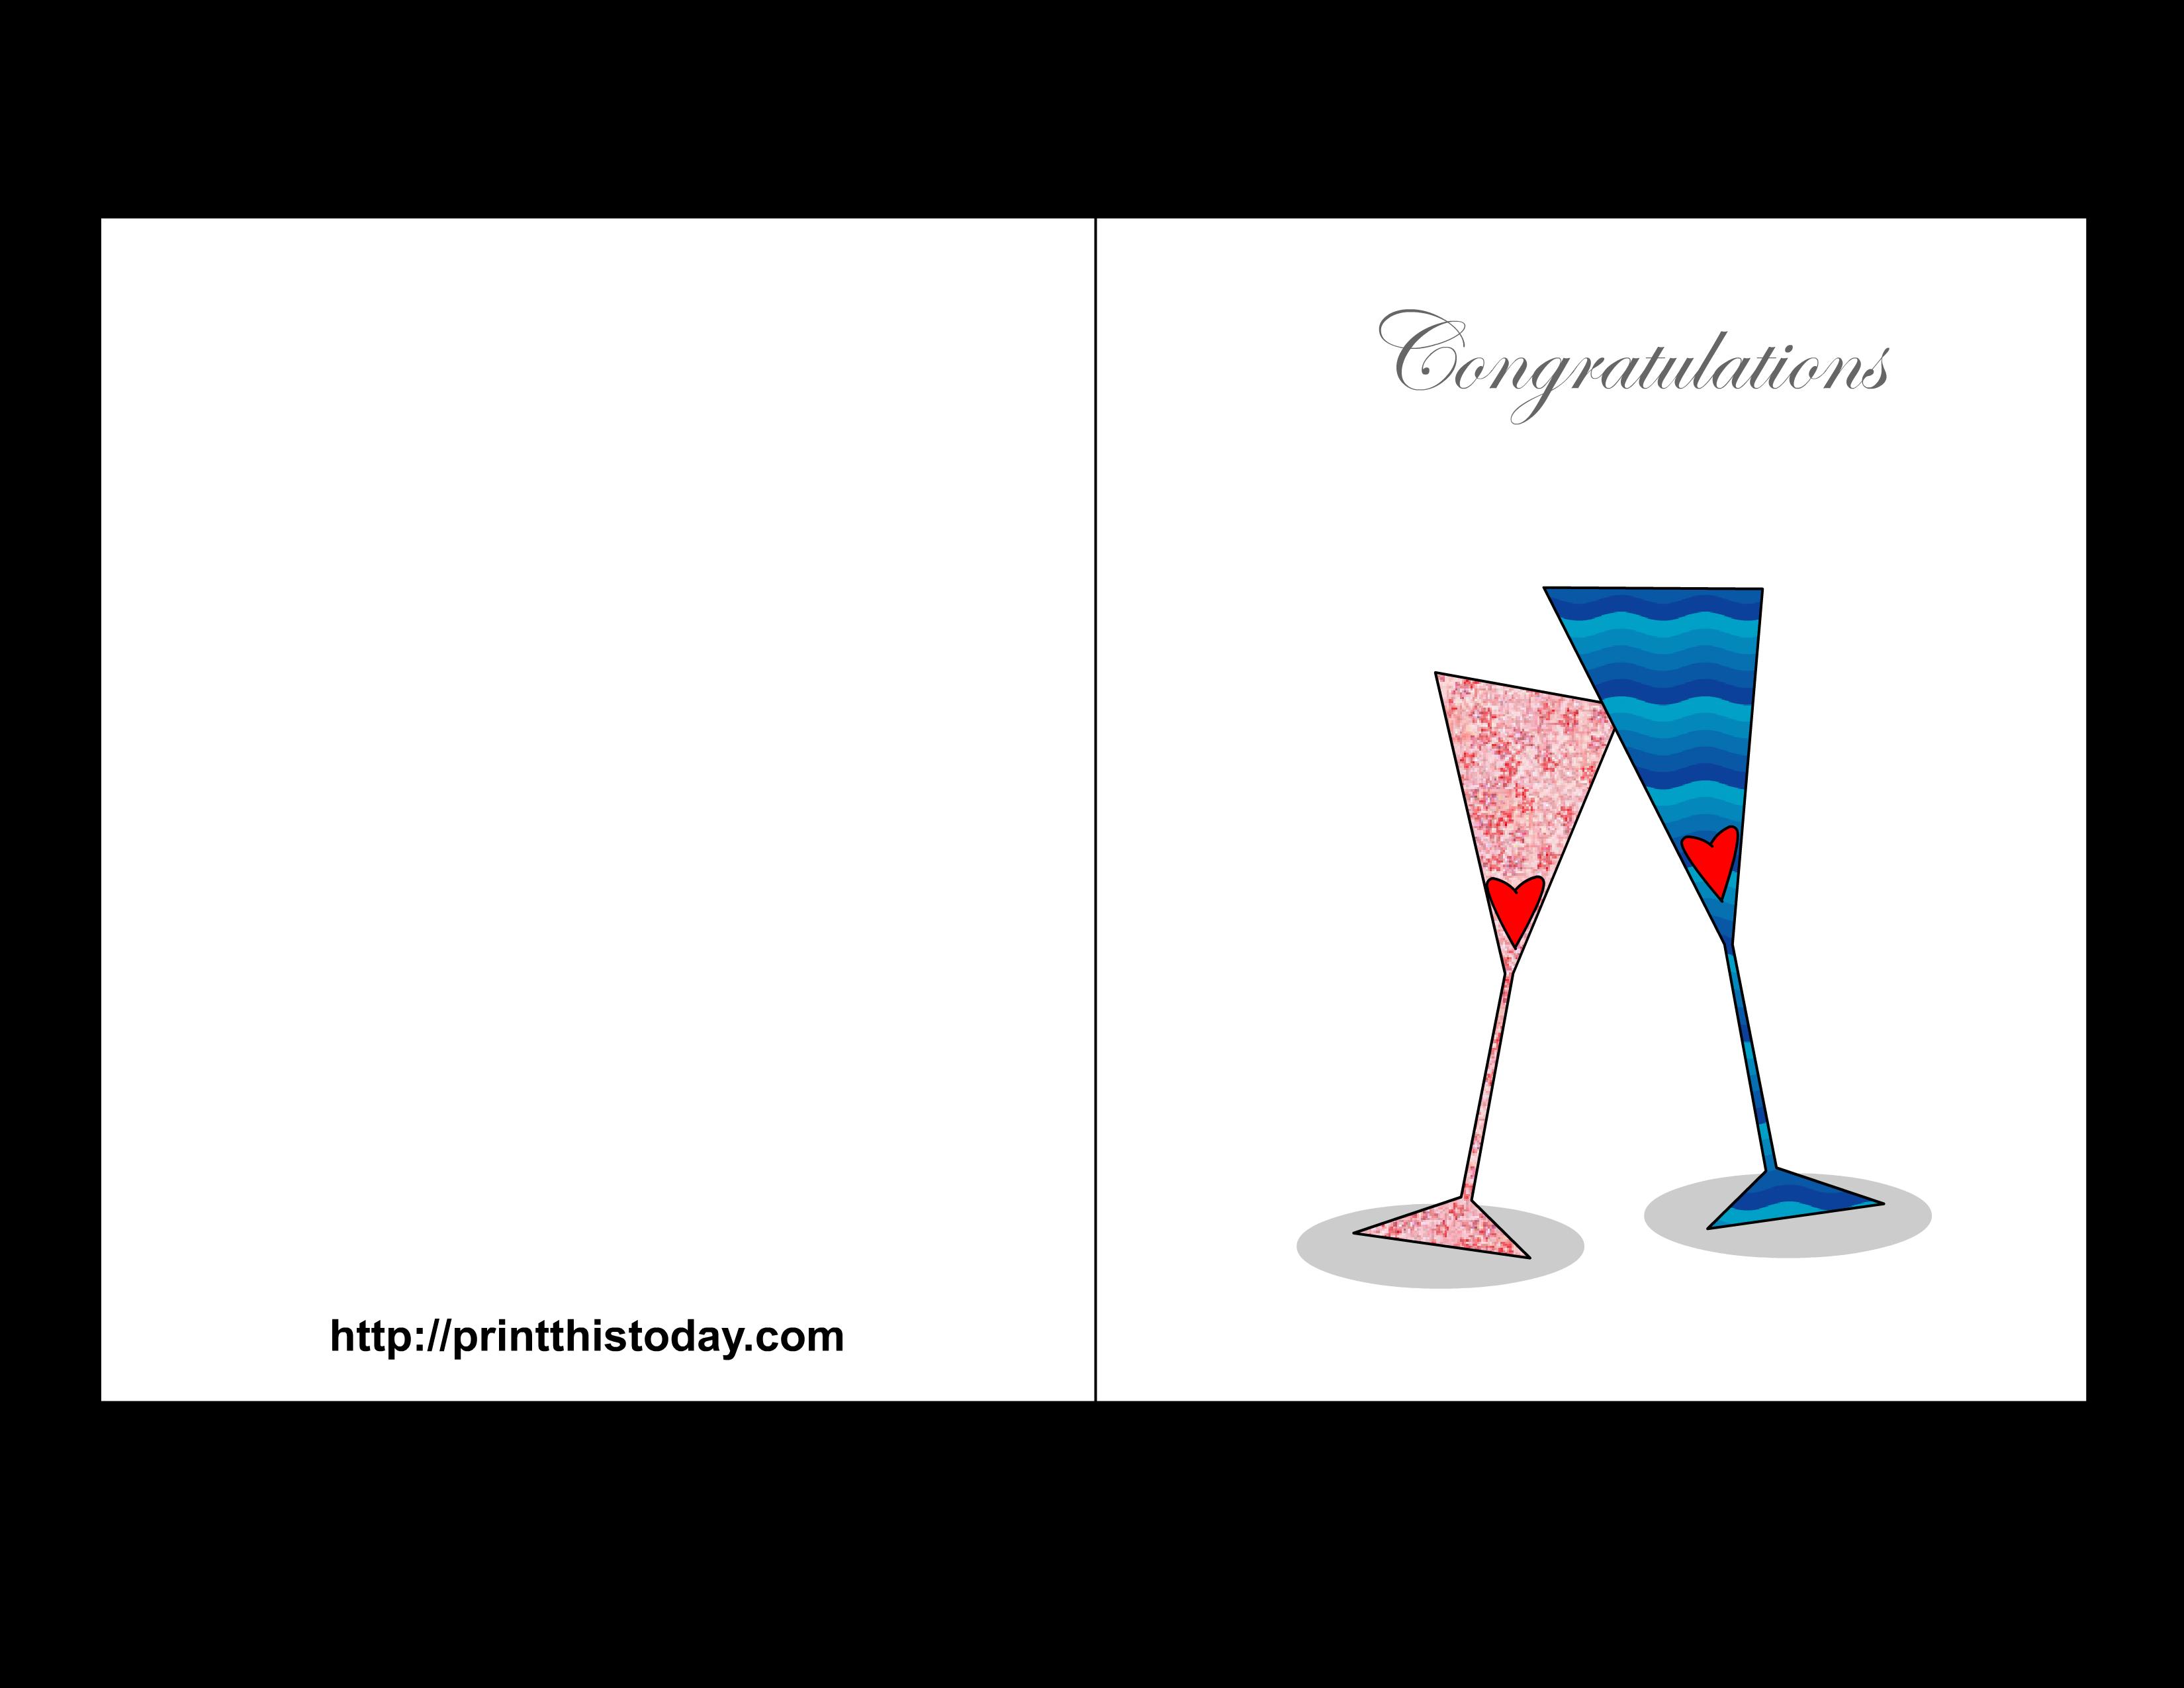 Free Printable Wedding Congratulations Cards: printthistoday.com/free-printable-wedding-congratulations-cards